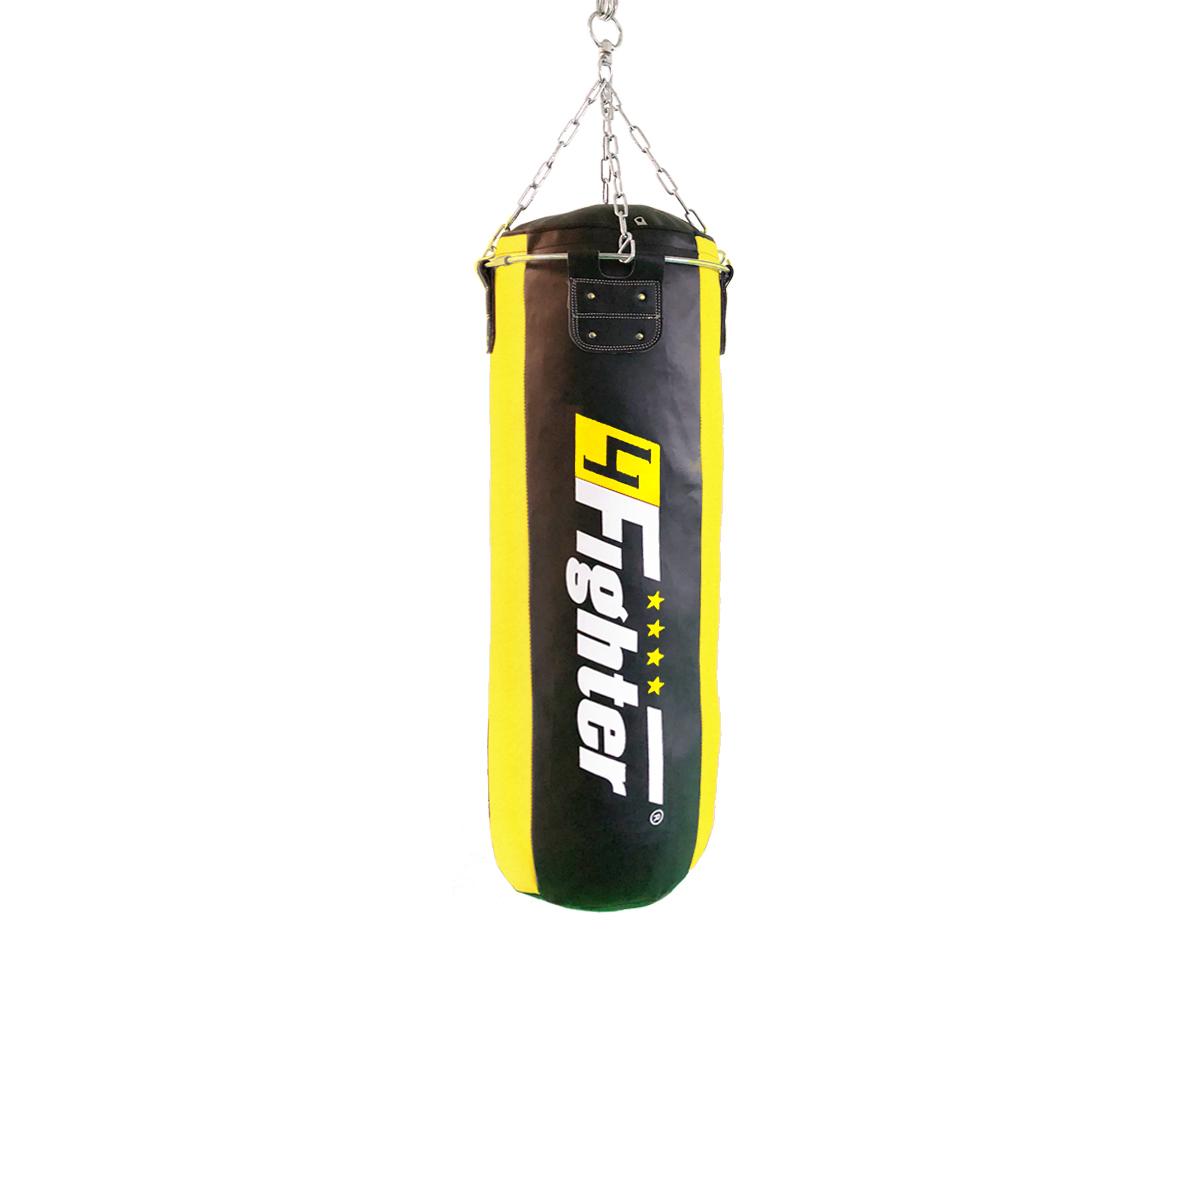 4Fighter Profi Kunstleder Boxsack / Sandsack - schwarz/gelb, gefüllt 100cm